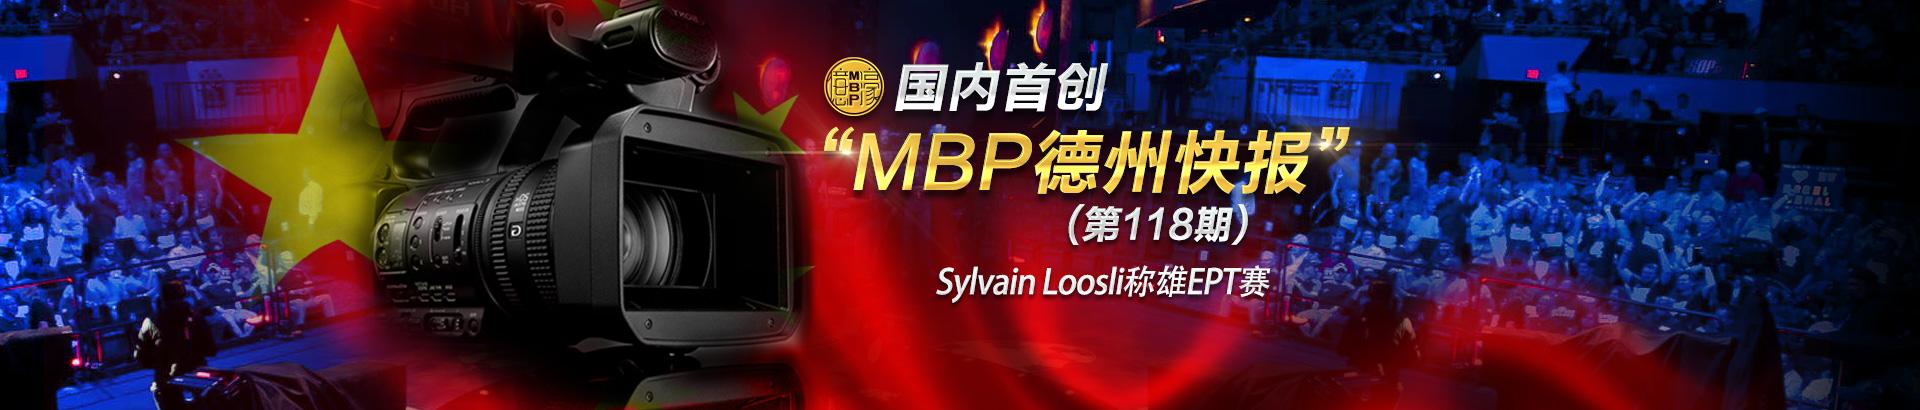 《MBP德州快报》第118期:Sylvain Loosli称雄EPT赛